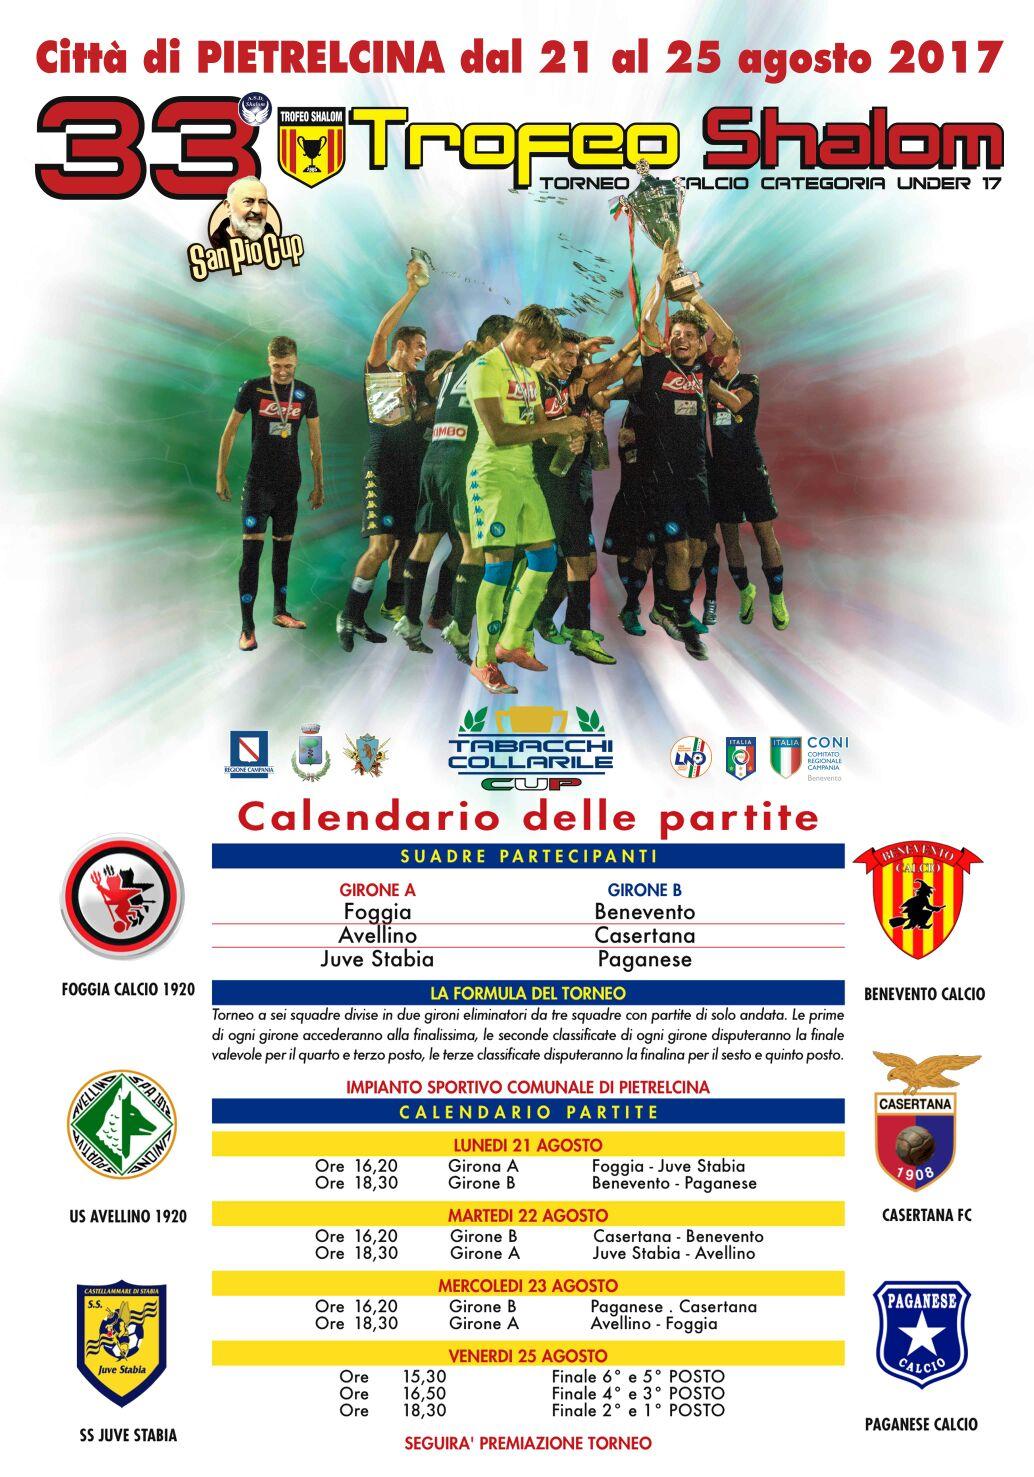 Calendario Benevento Calcio.Presentato Il Calendario Del Trofeo Shalom A Pietrelcina